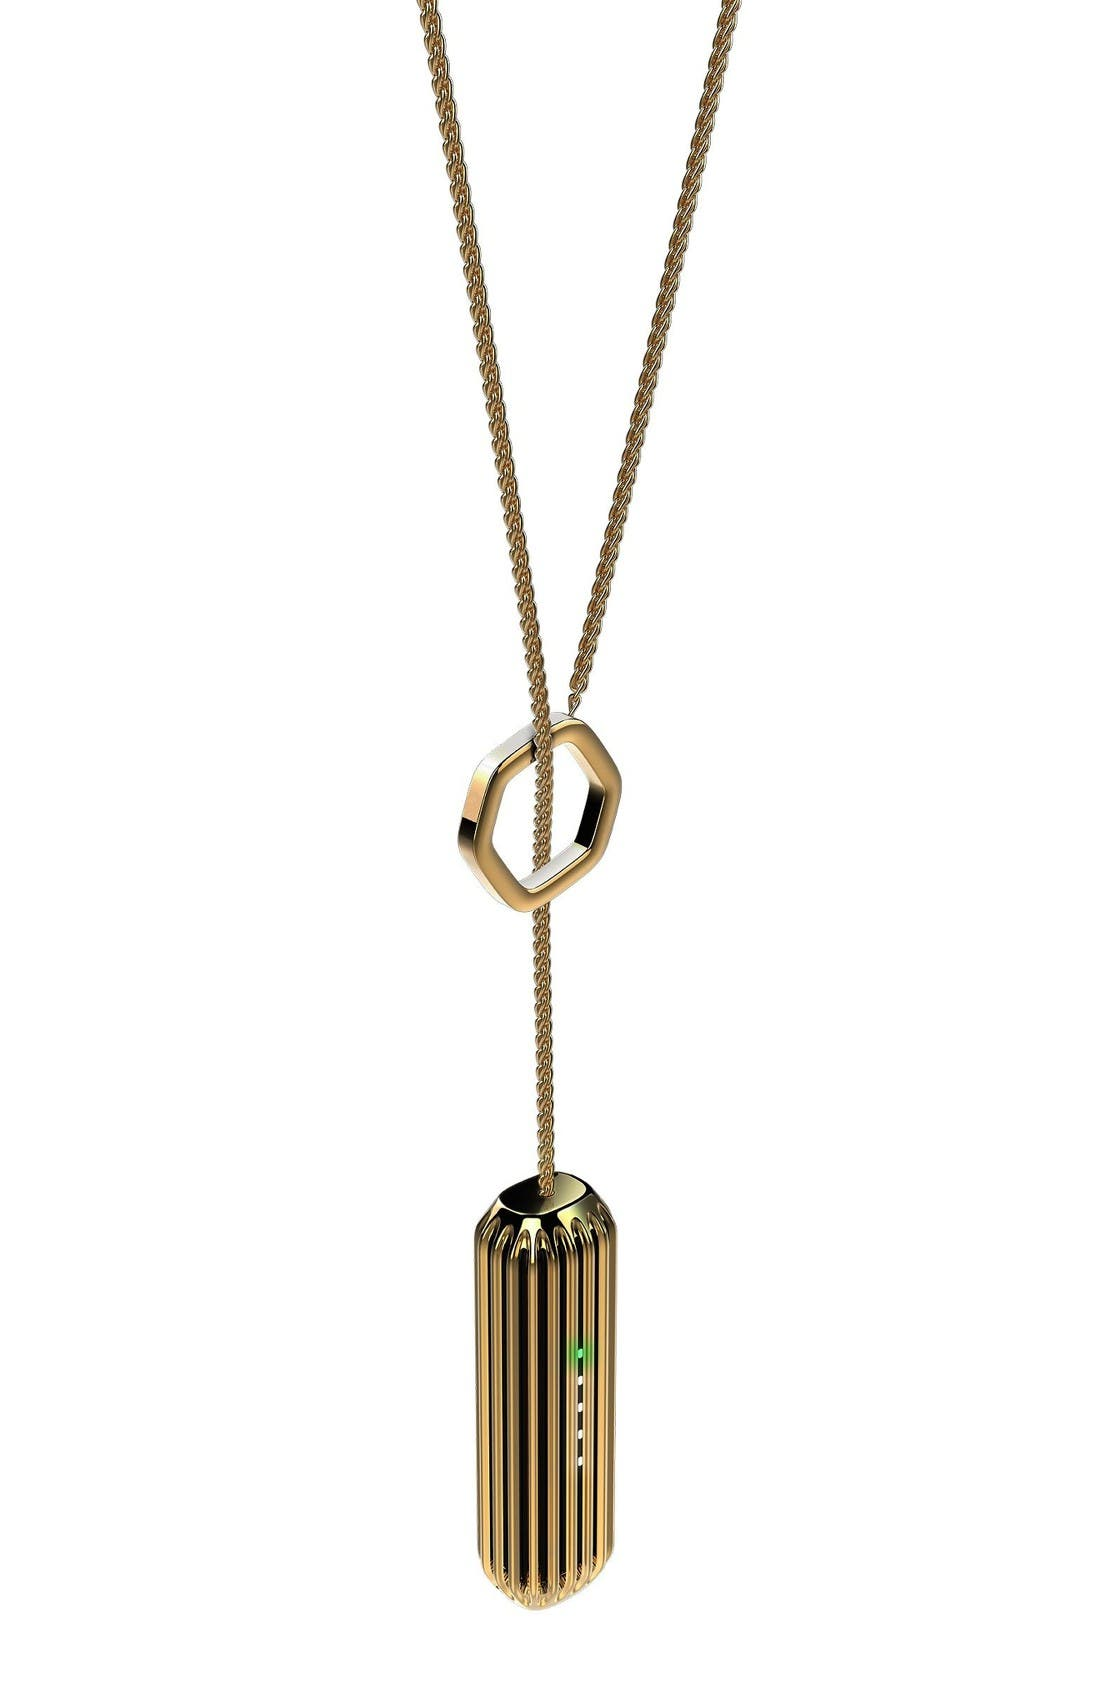 Flex 2 Lariat Pendant,                             Alternate thumbnail 2, color,                             Gold